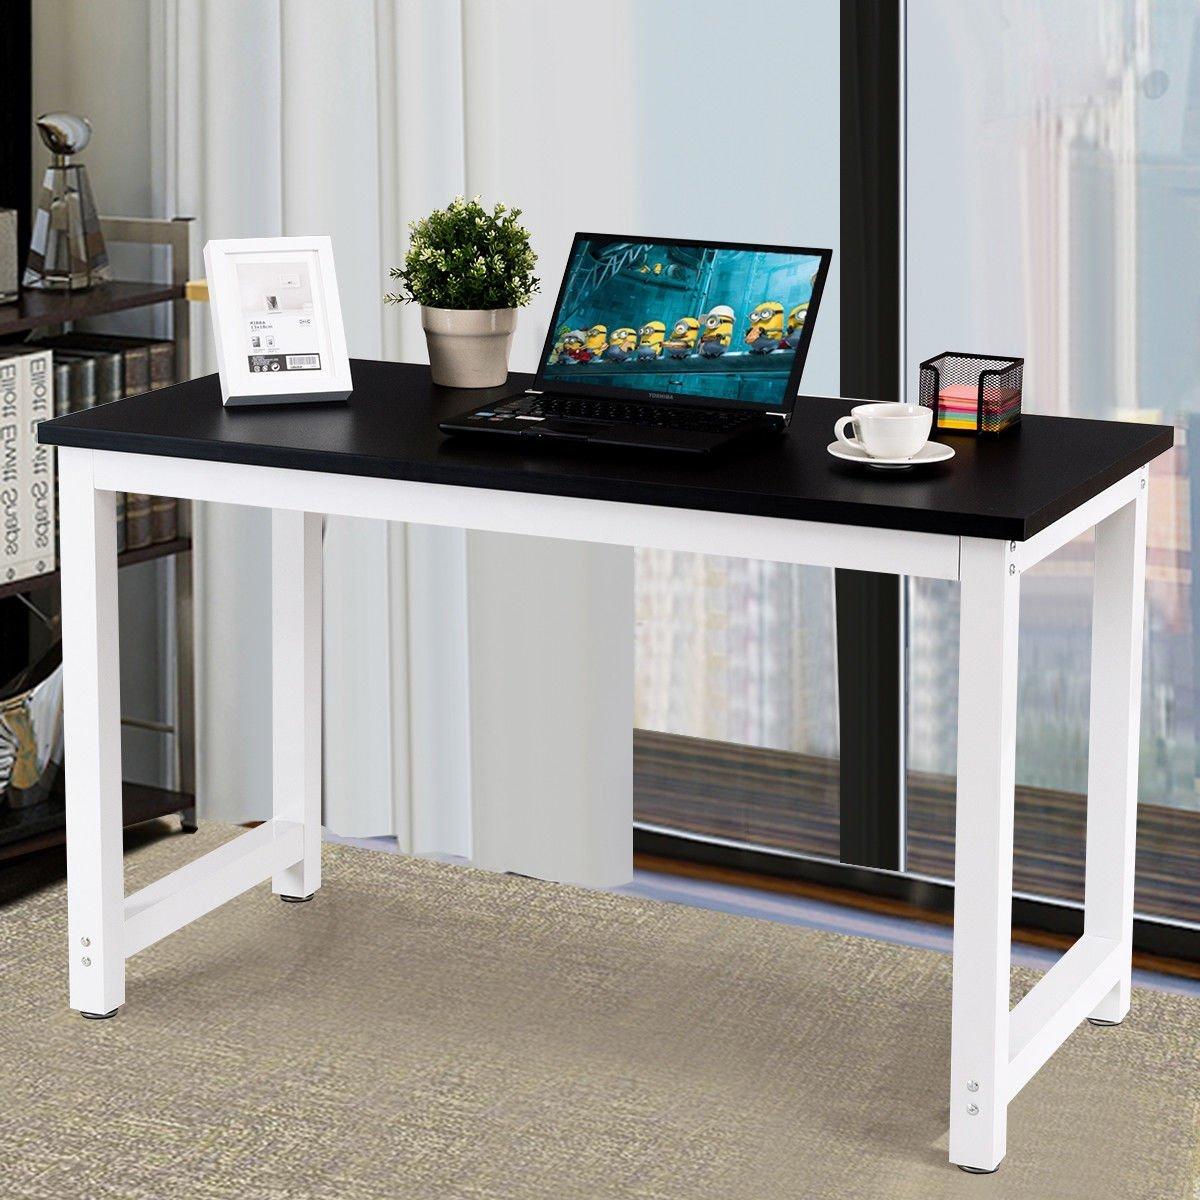 Amazon com chefjoy vd 53853hwbk computer desk pc laptop table wood workstation study home office furniture black kitchen dining